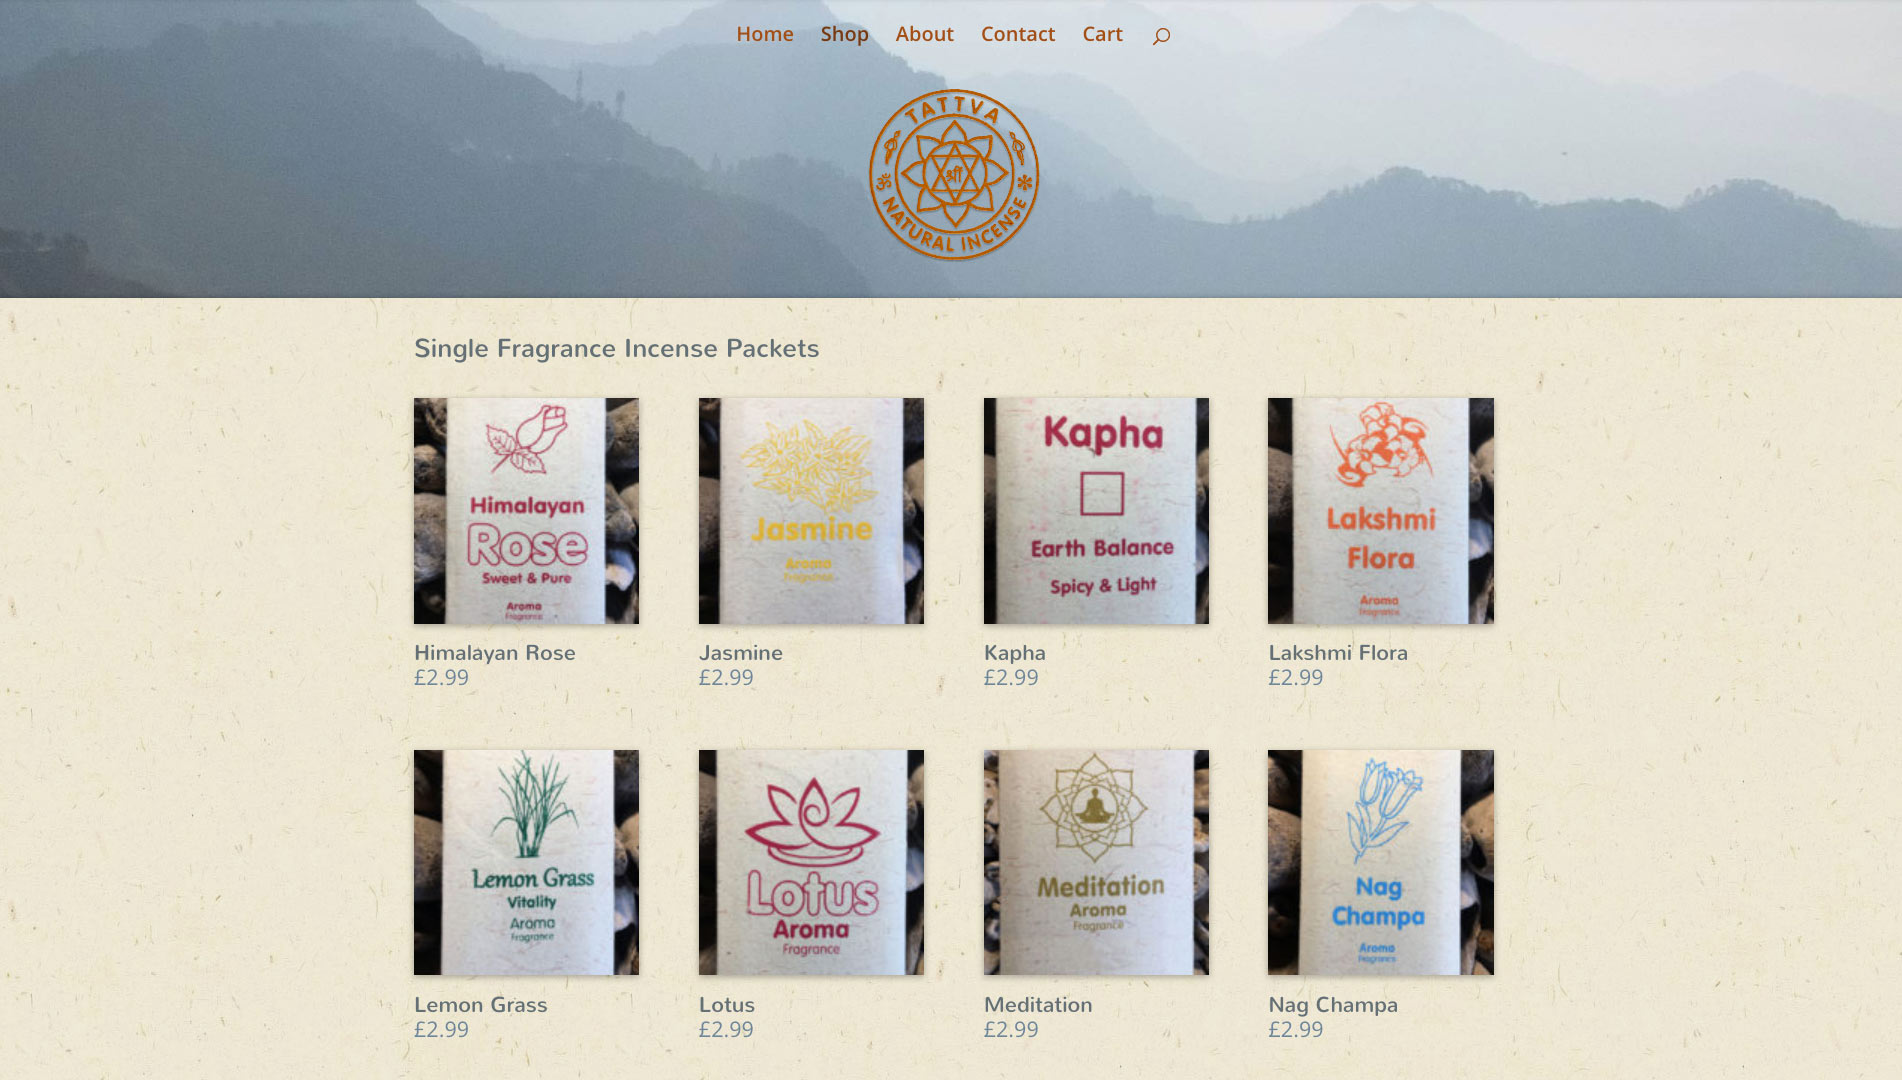 Tattva Incense shop page